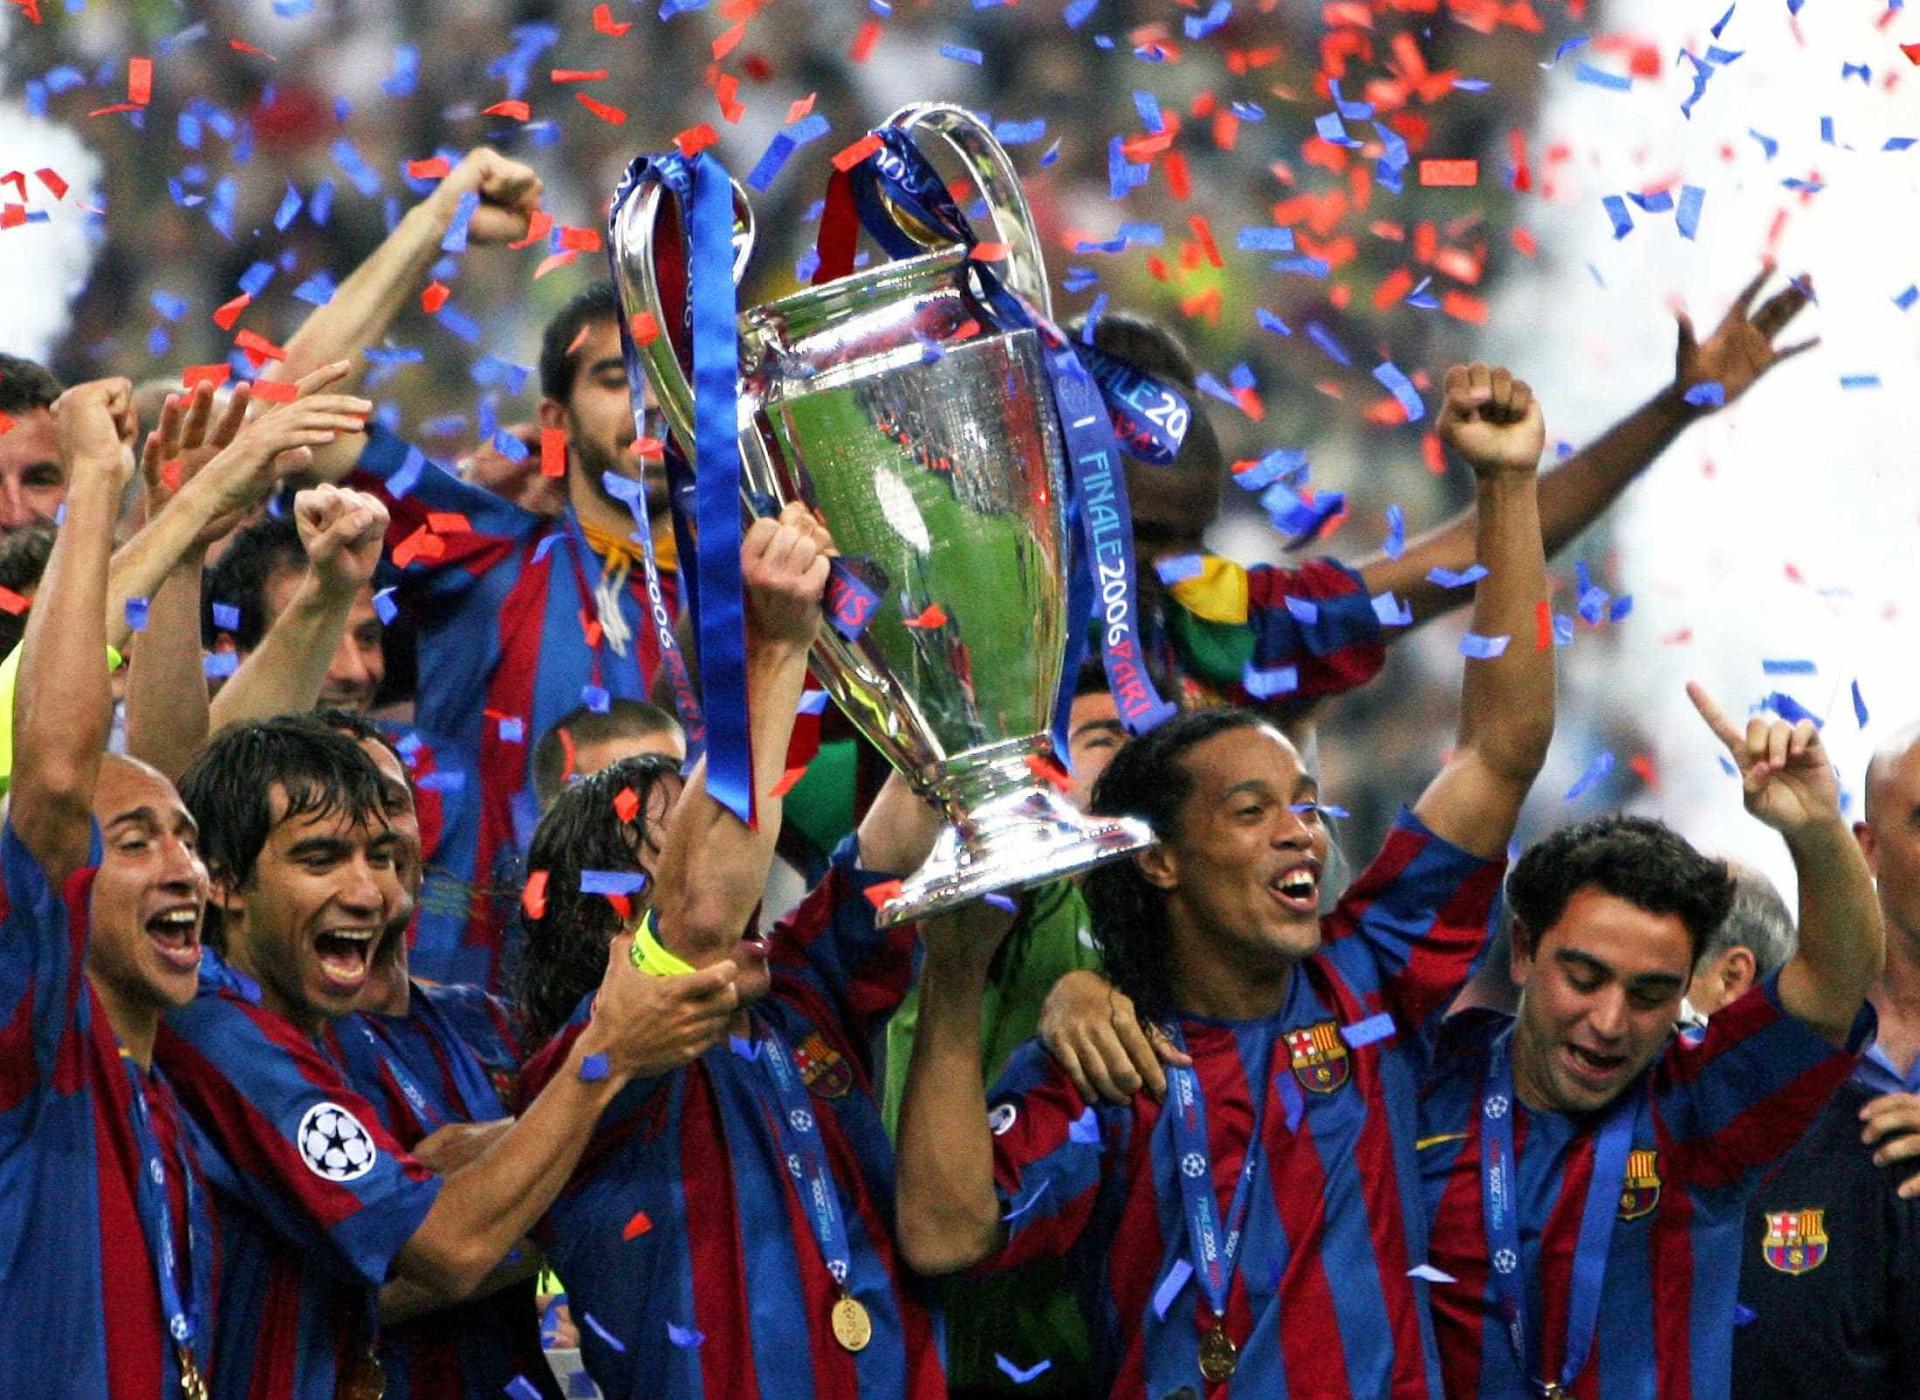 Barcelona posta vídeo comemorando 12 anos do título da Champions